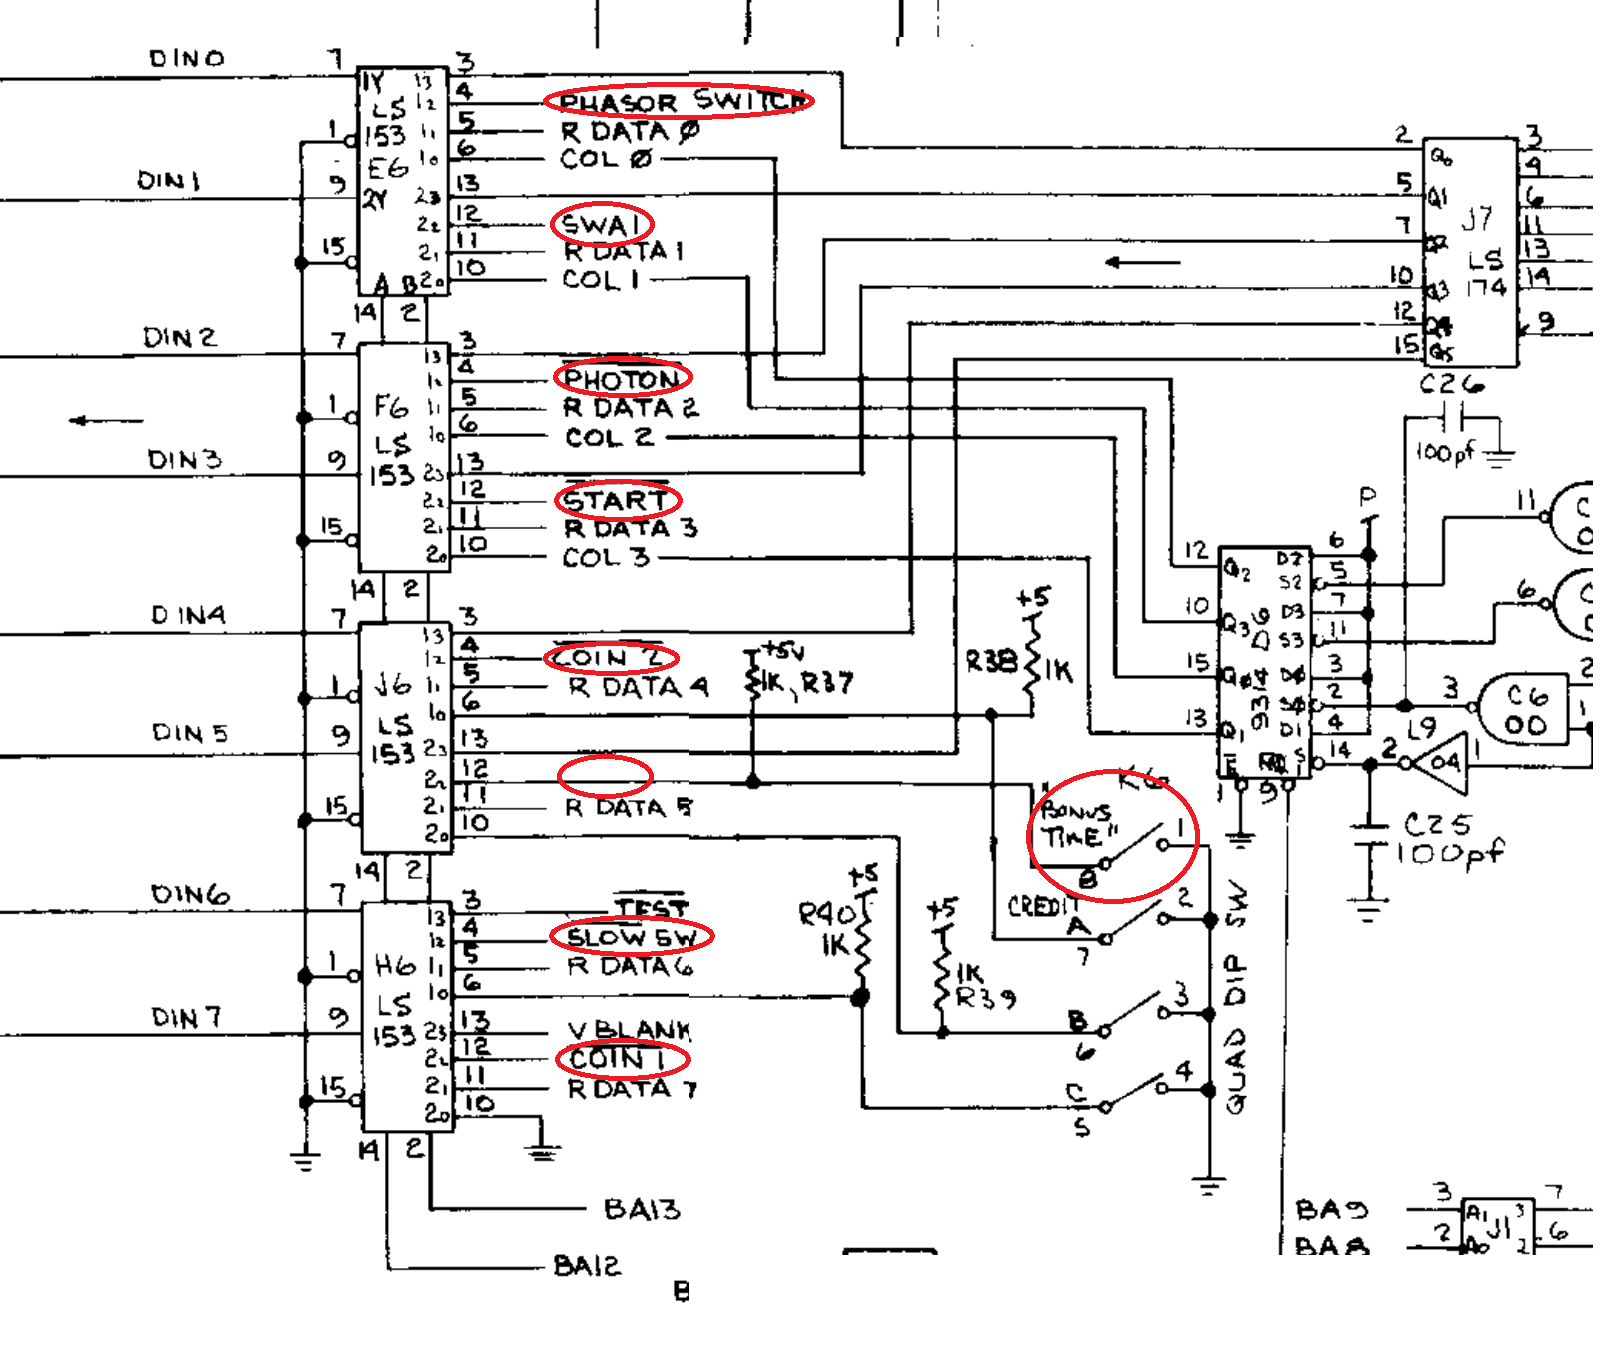 small resolution of llv wiring diagram 88 box wiring diagram suburban wiring diagram llv wiring diagram 88